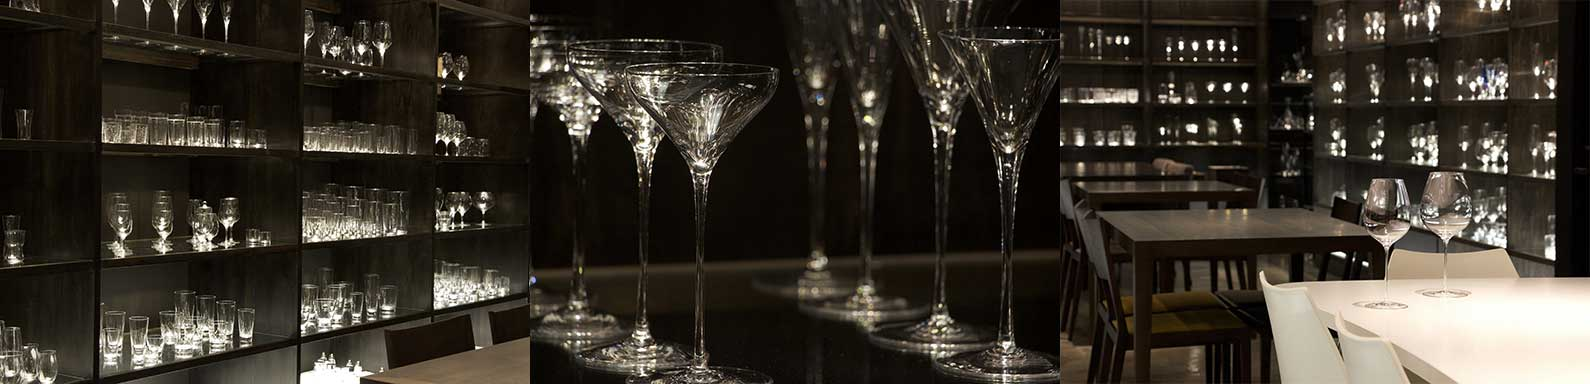 Kimura glass, Japan,